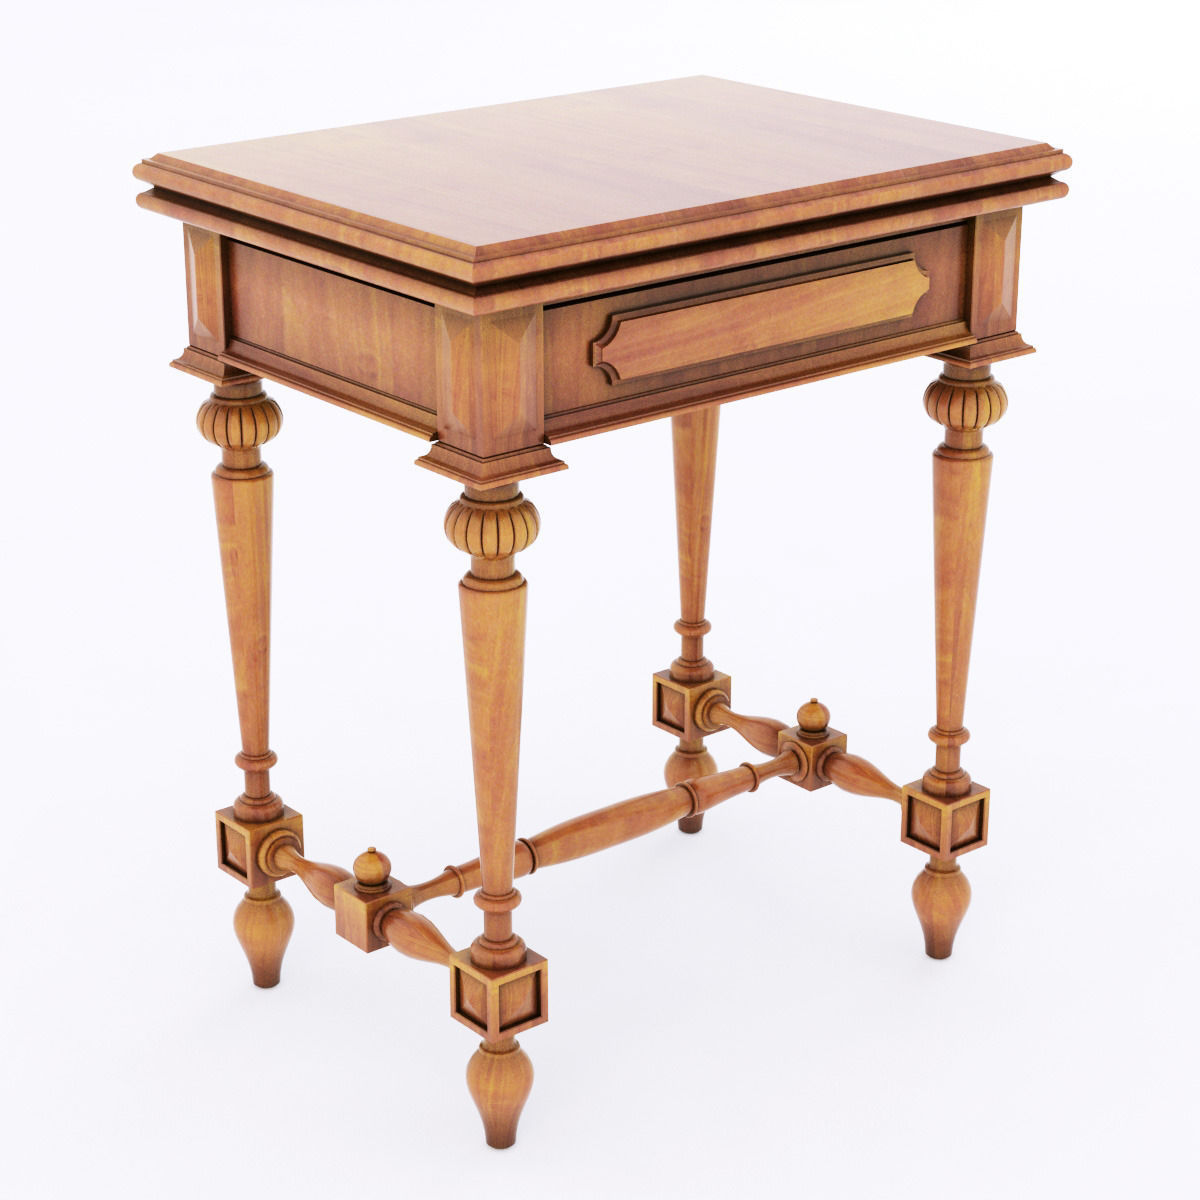 Antique wood table 3d model max obj 3ds fbx for Table 3d model